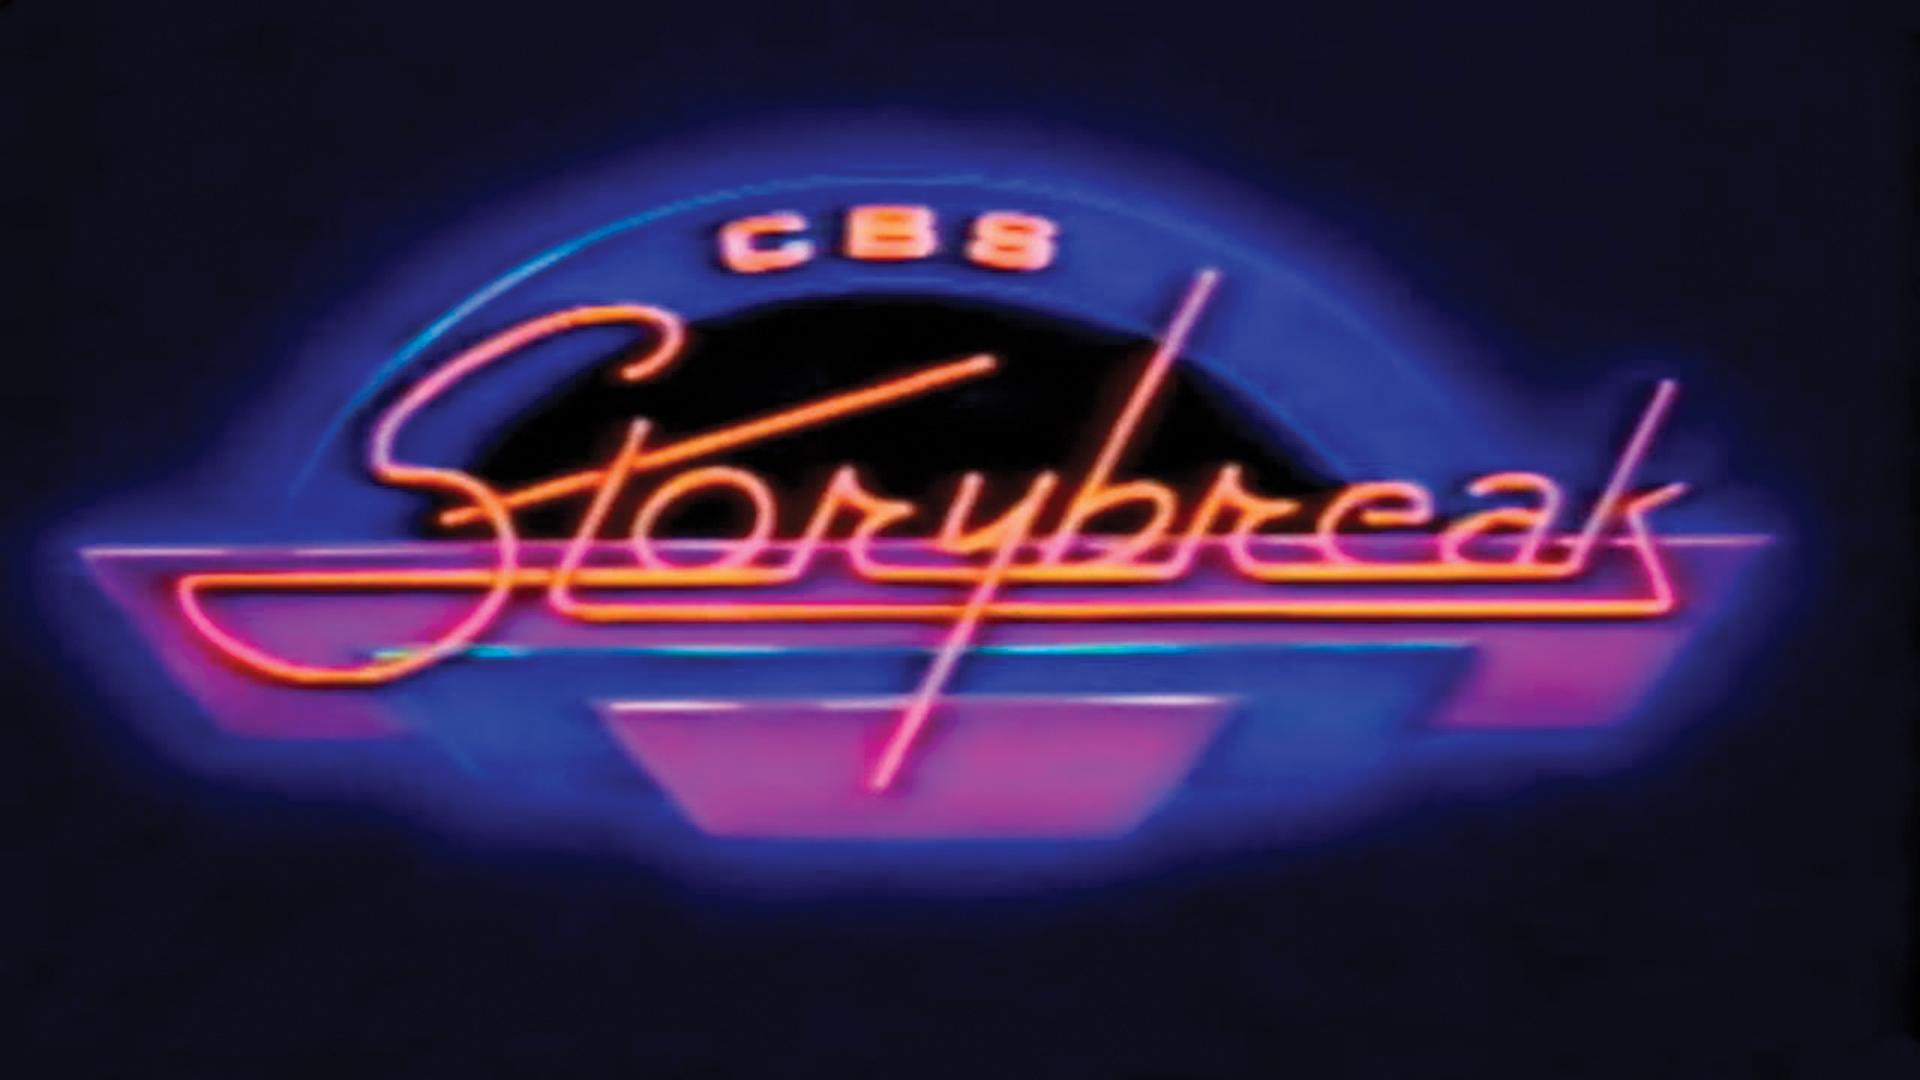 CBS Storybreak (1985–1988)